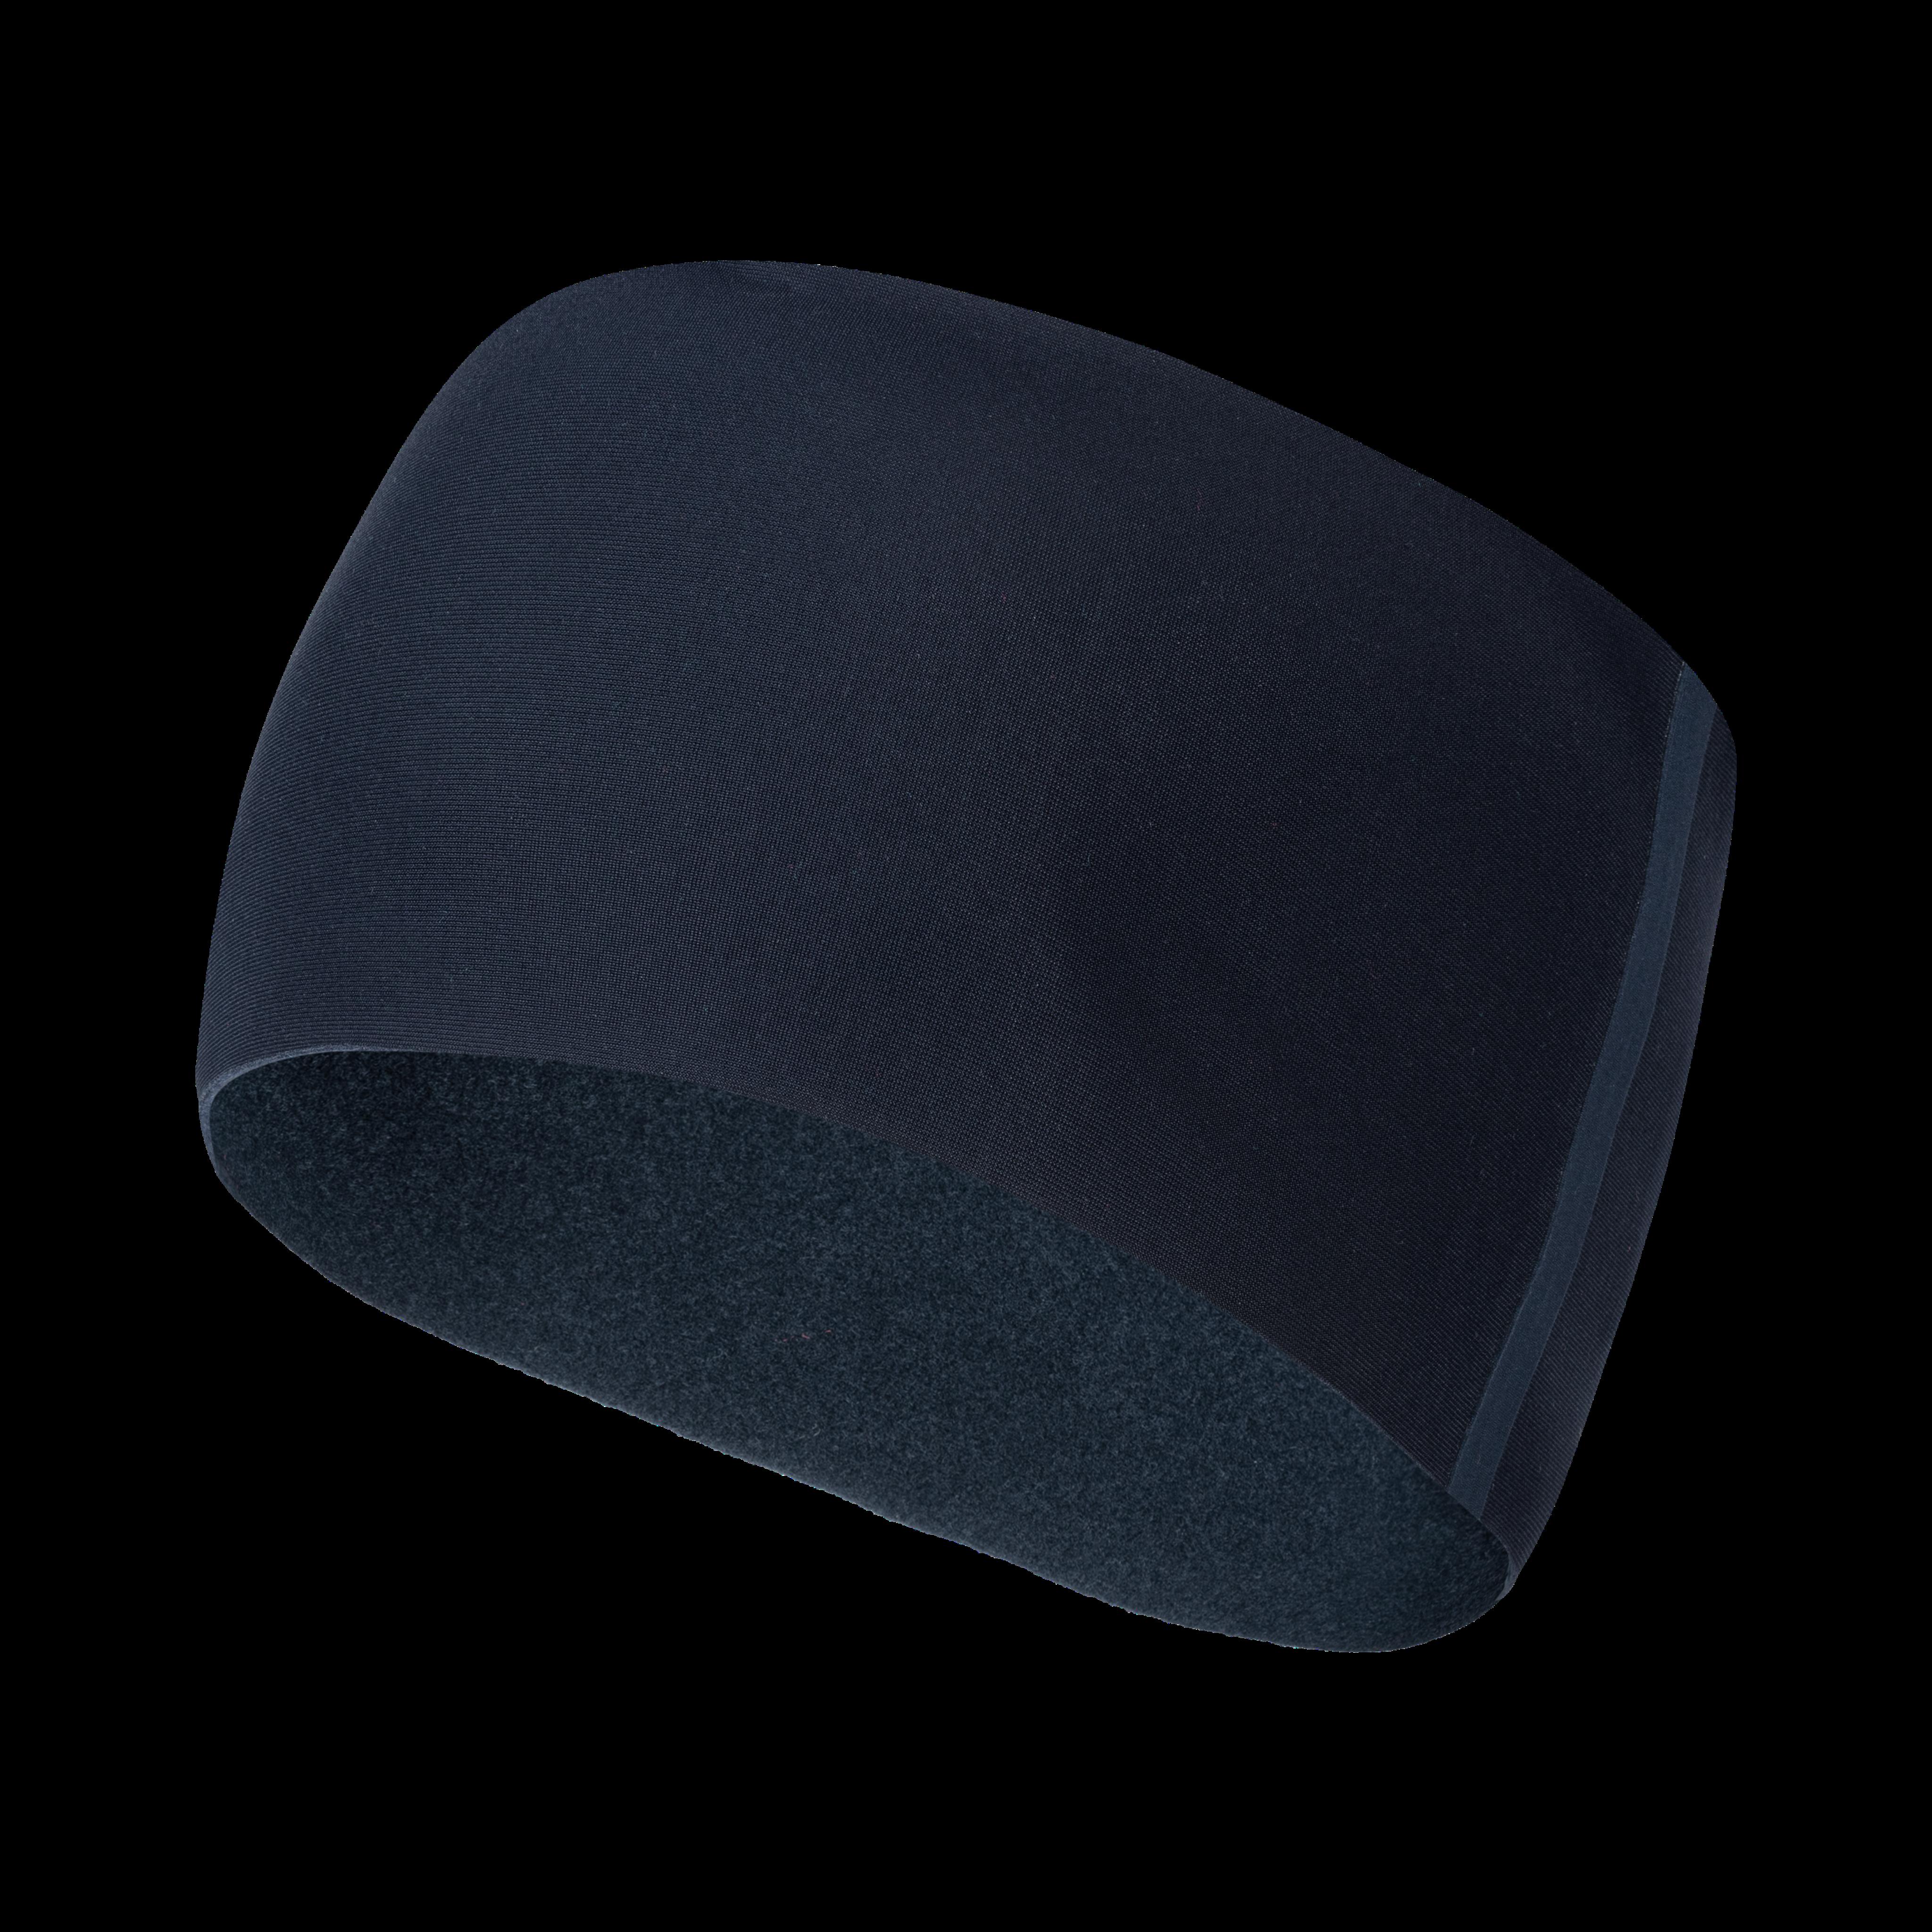 Aenergy Headband - night, one size thumbnail